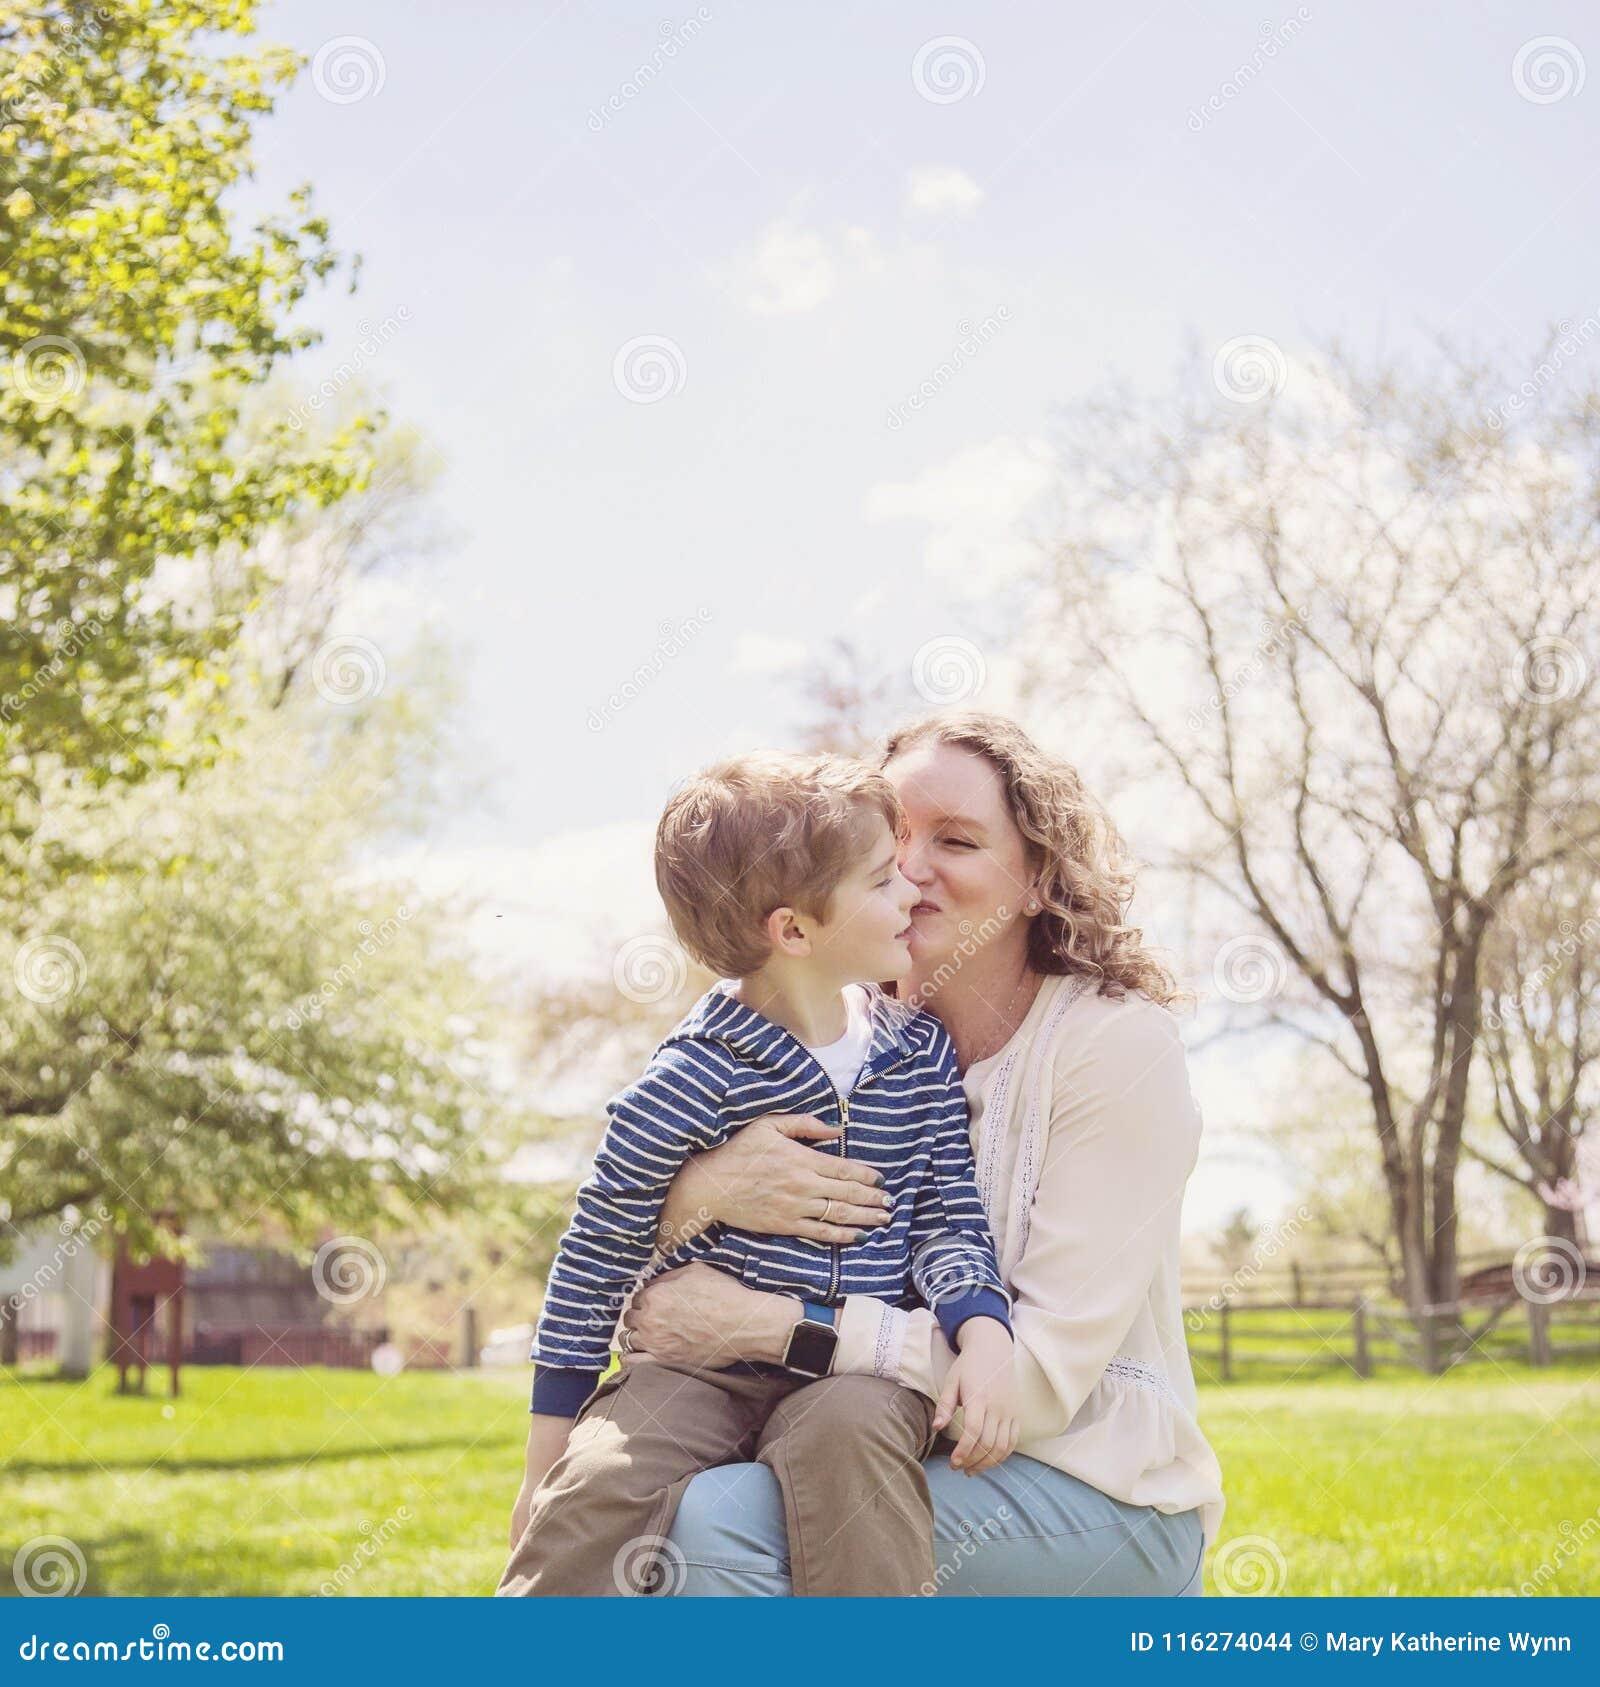 b6d4bf0d7ce Χαμογελώντας αγόρι τετράχρονων παιδιών που παίρνει τα αγκαλιάσματα και τα  φιλιά από τη γιαγιά στο πάρκο Οικογενειακή αγάπη